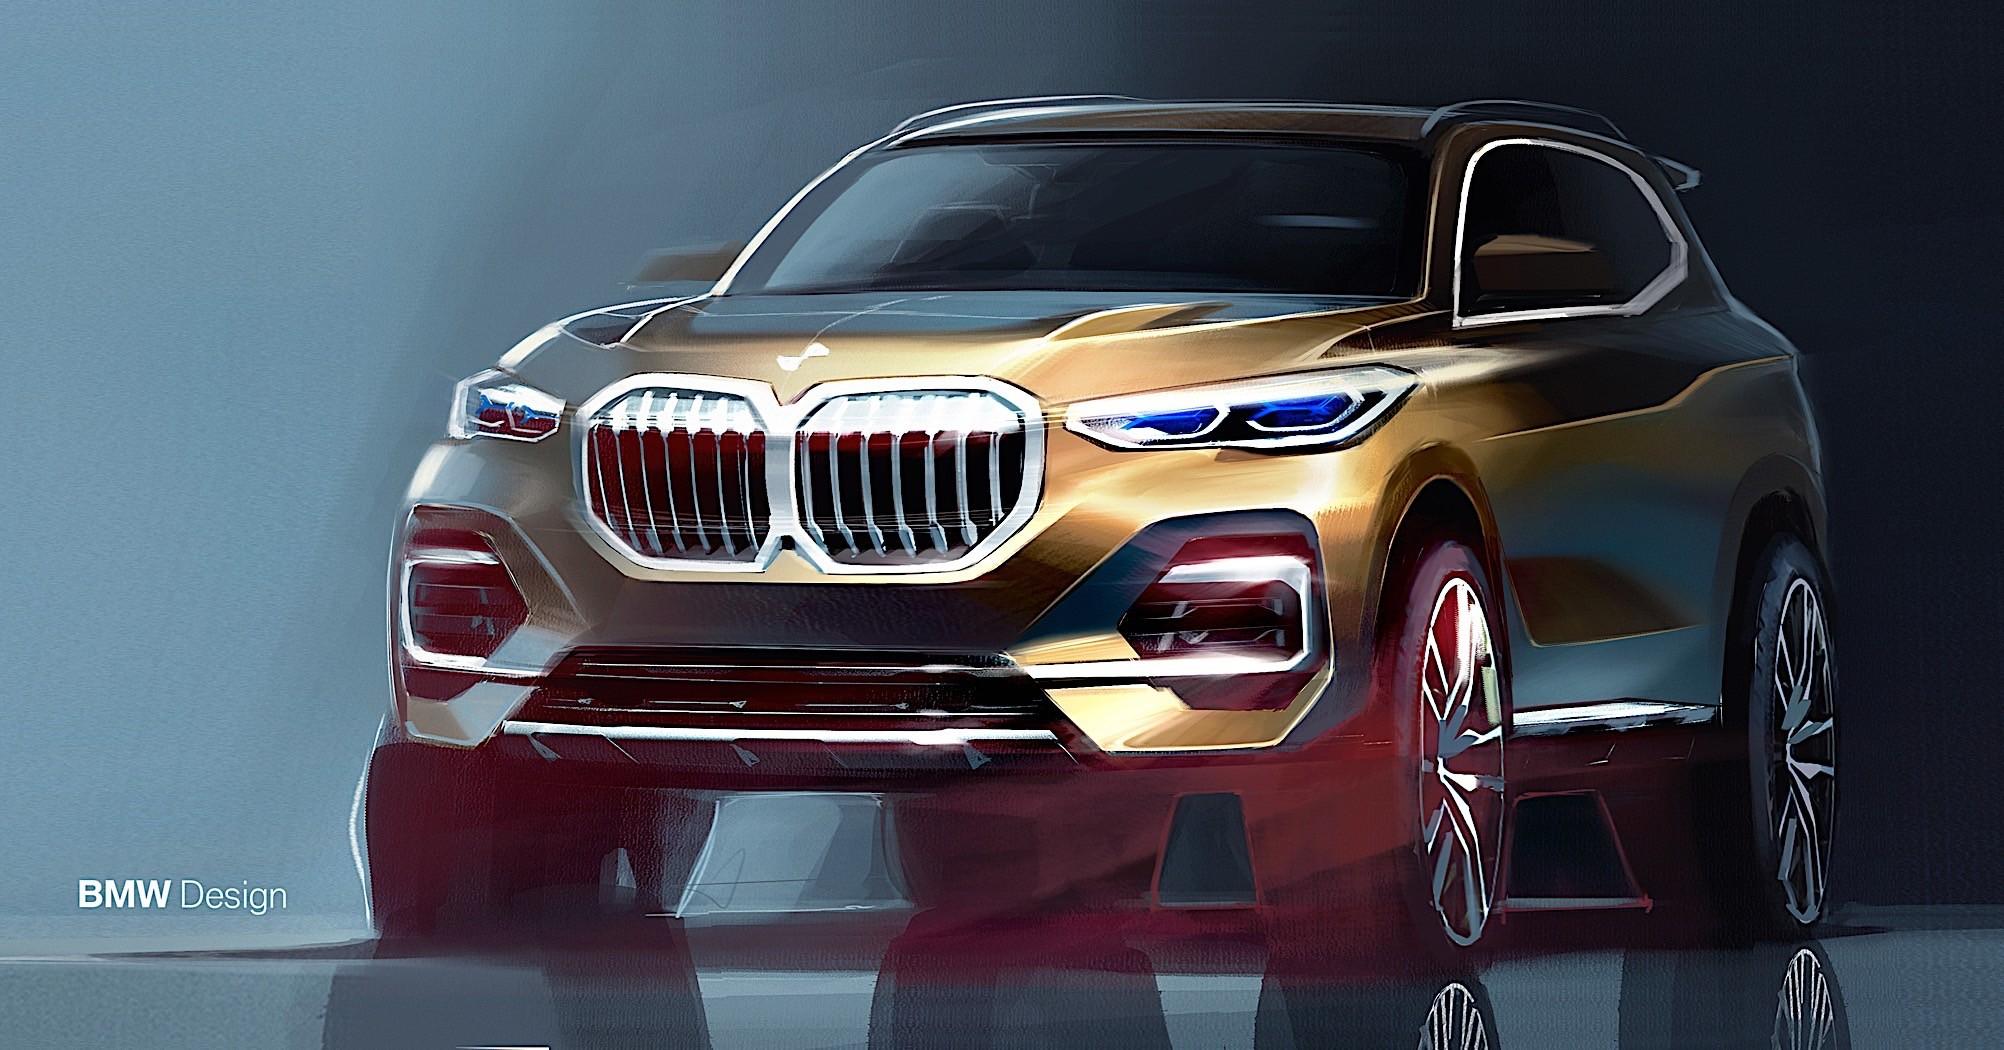 Bmw X5 M50d >> 2019 BMW X5 Configurator Goes Live - autoevolution